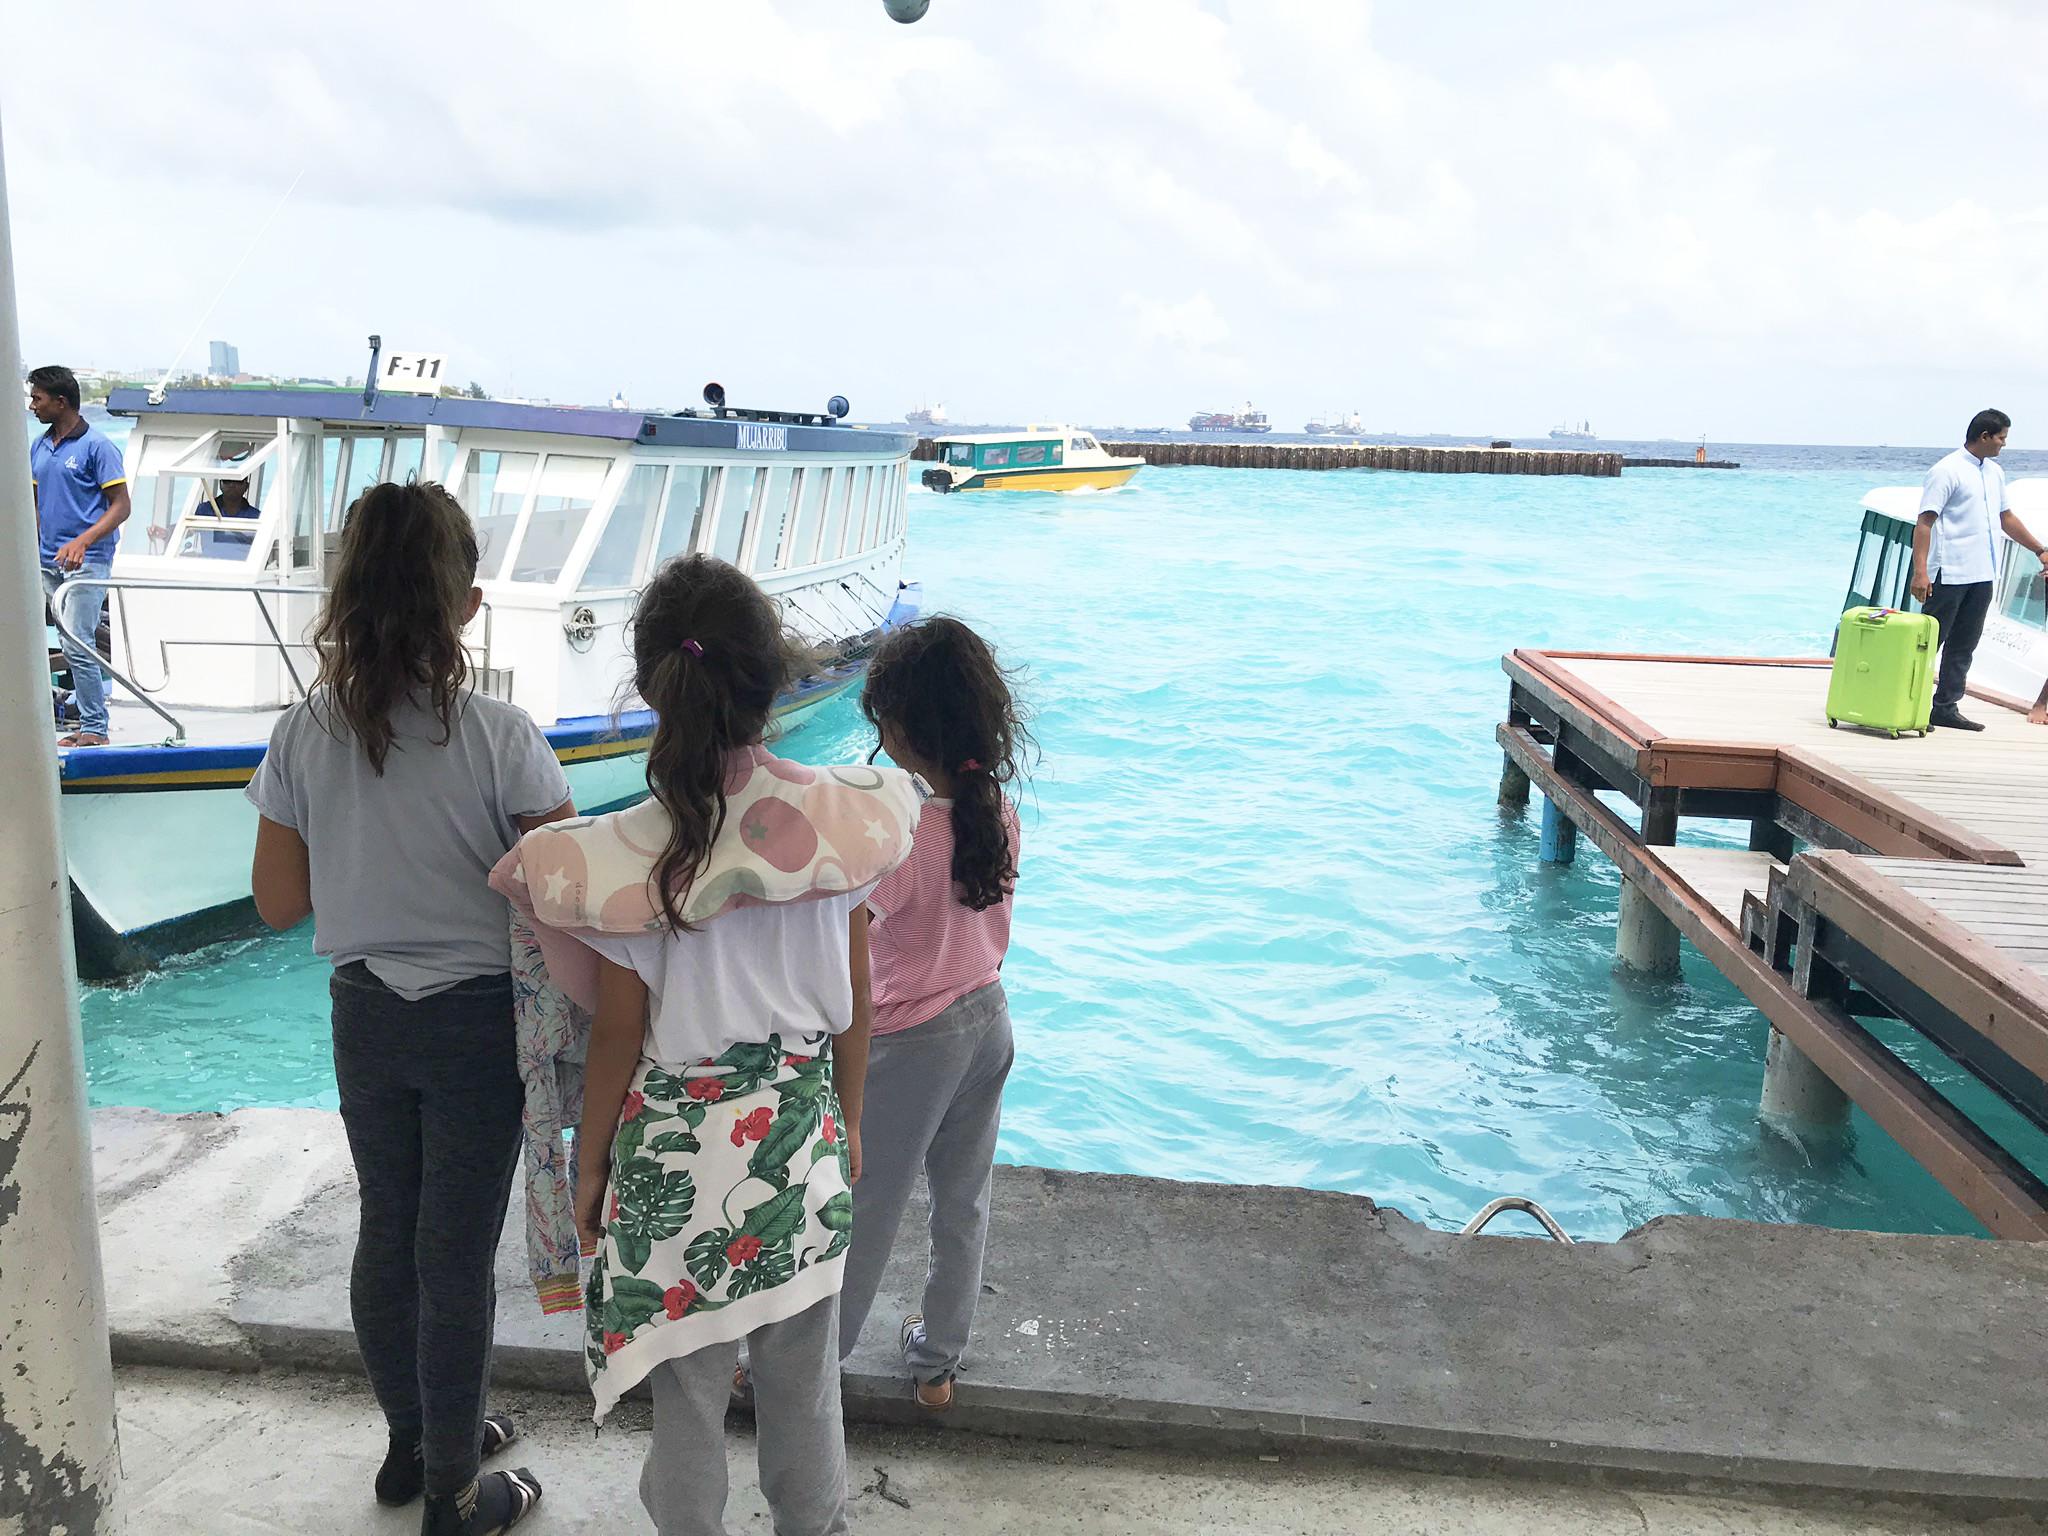 Malediven mit Kindern - Ankunft am Flughafen Malé